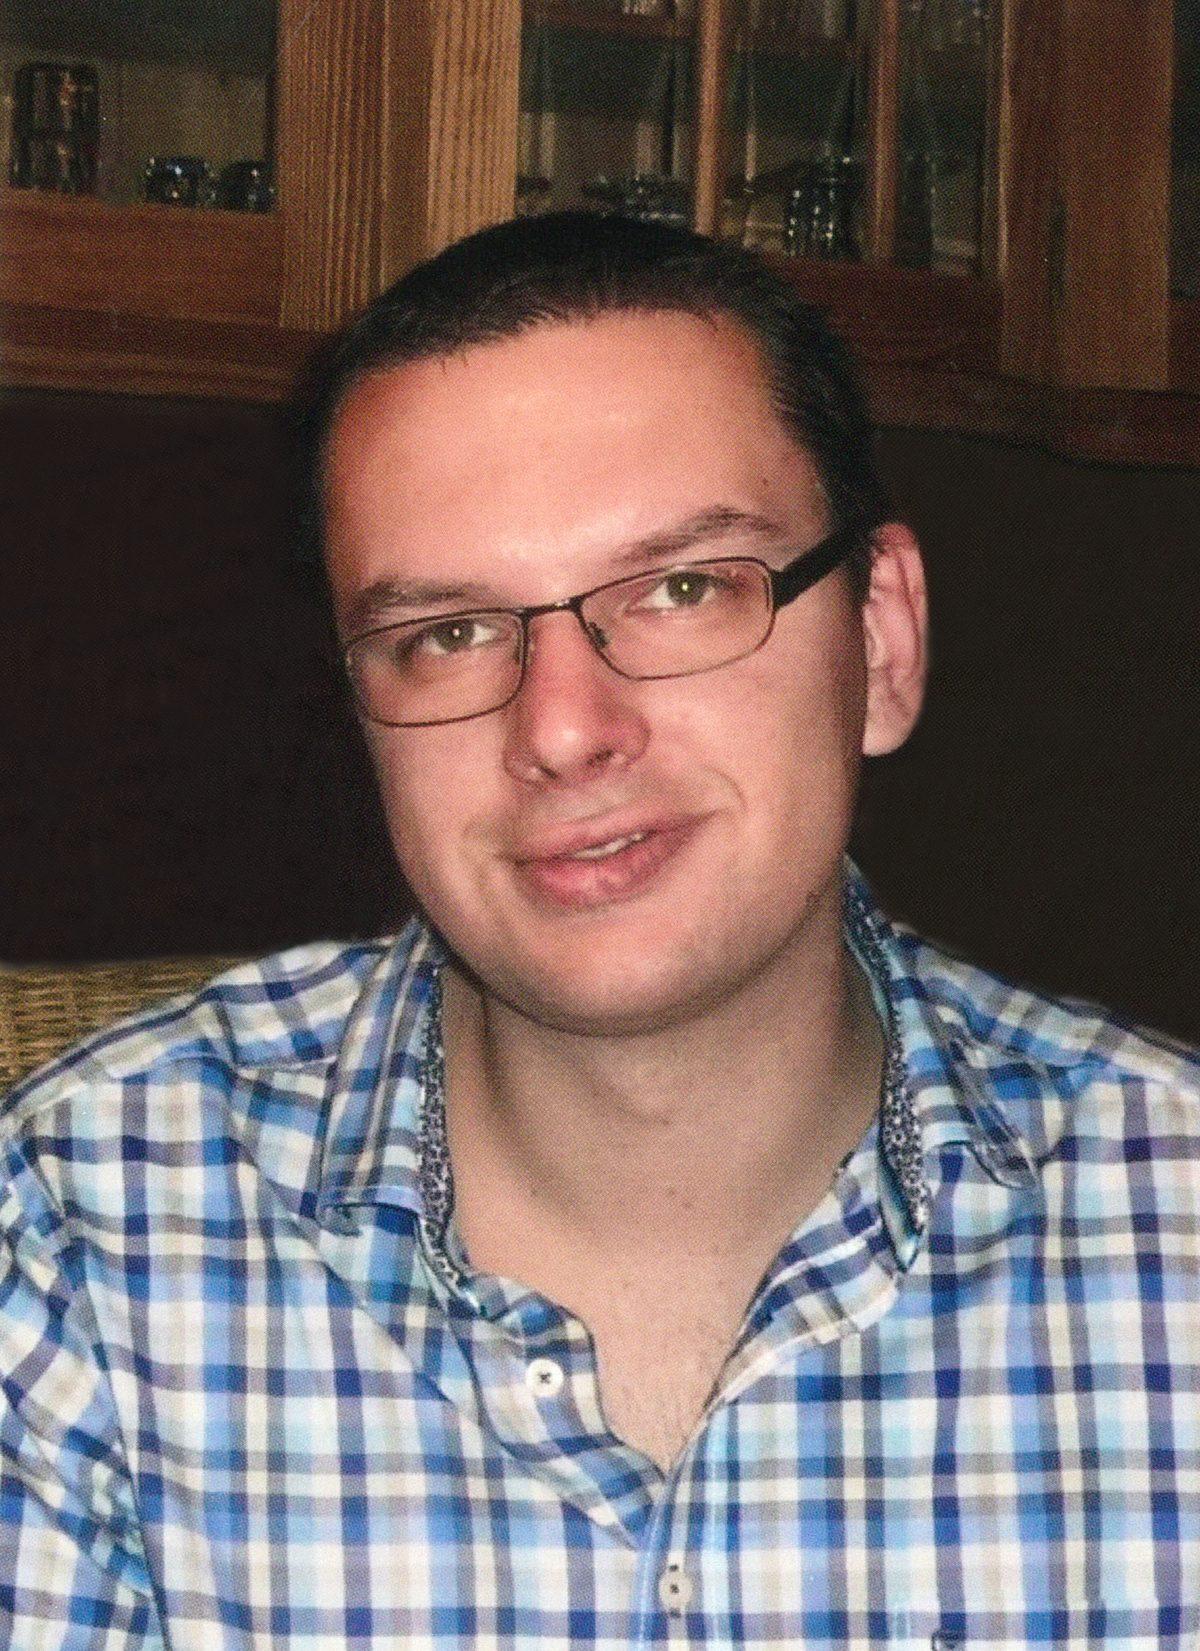 Christian Harth